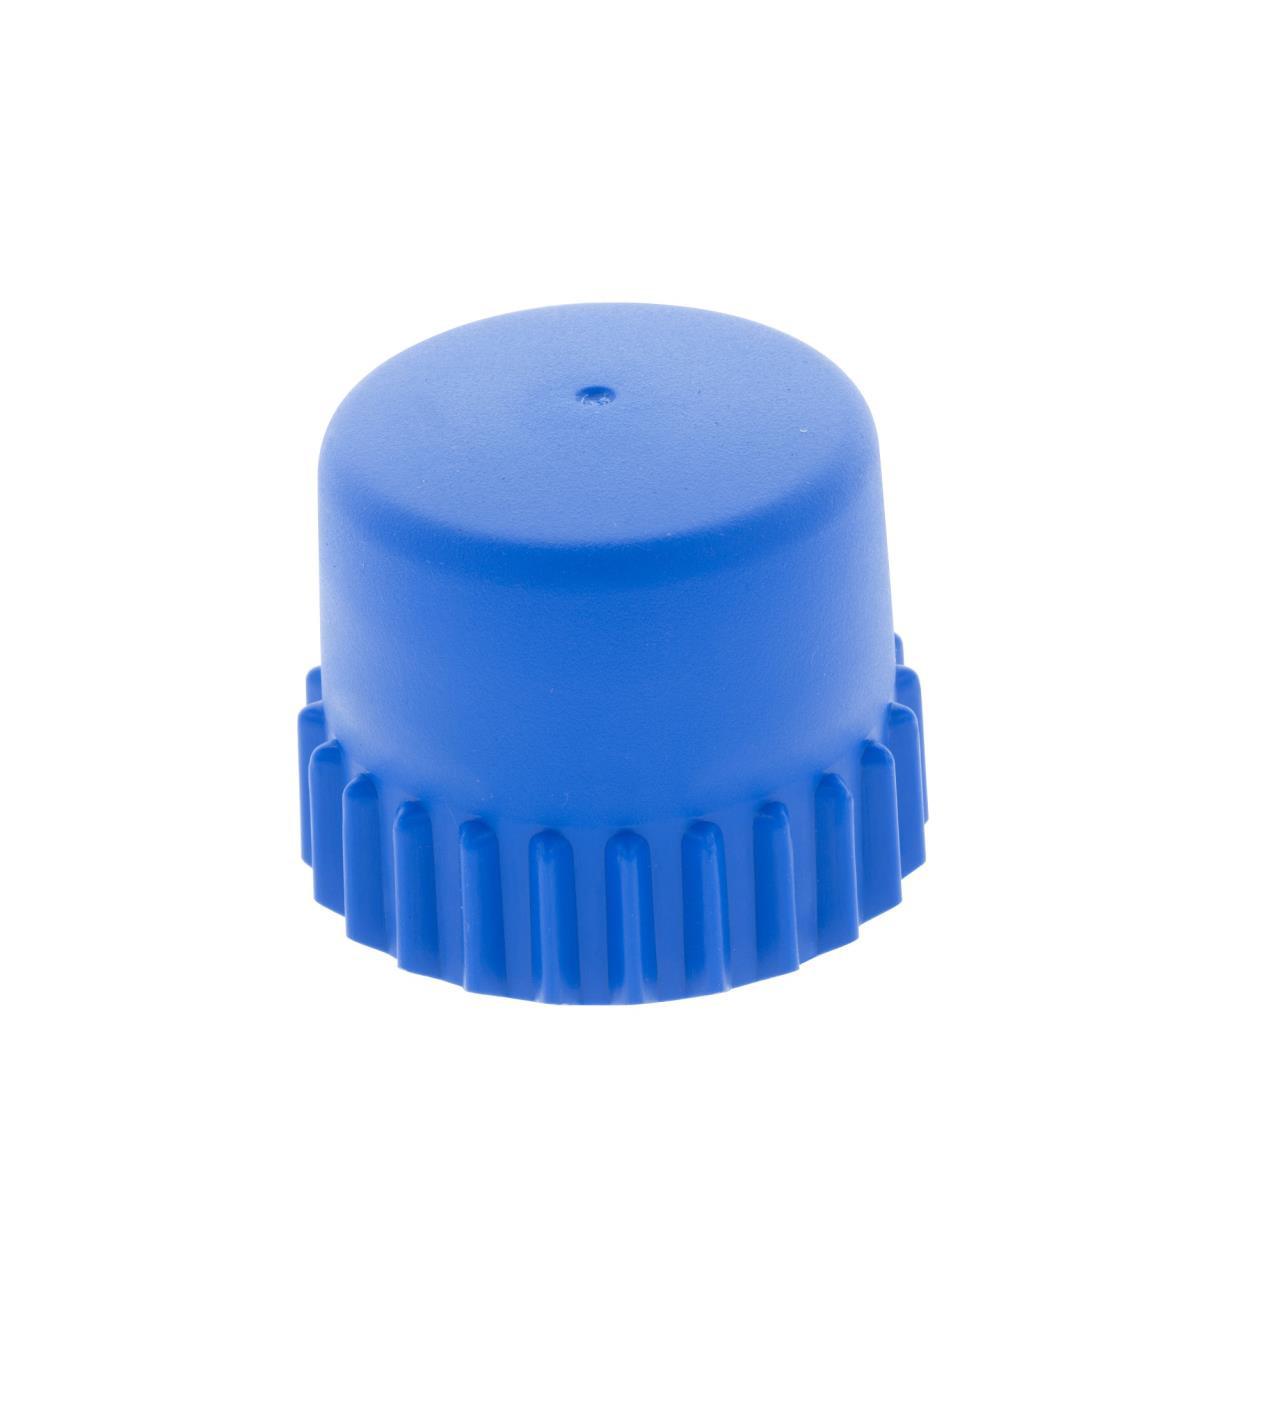 Husqvarna udløserknop f/tråd, T25B trimmerhoved